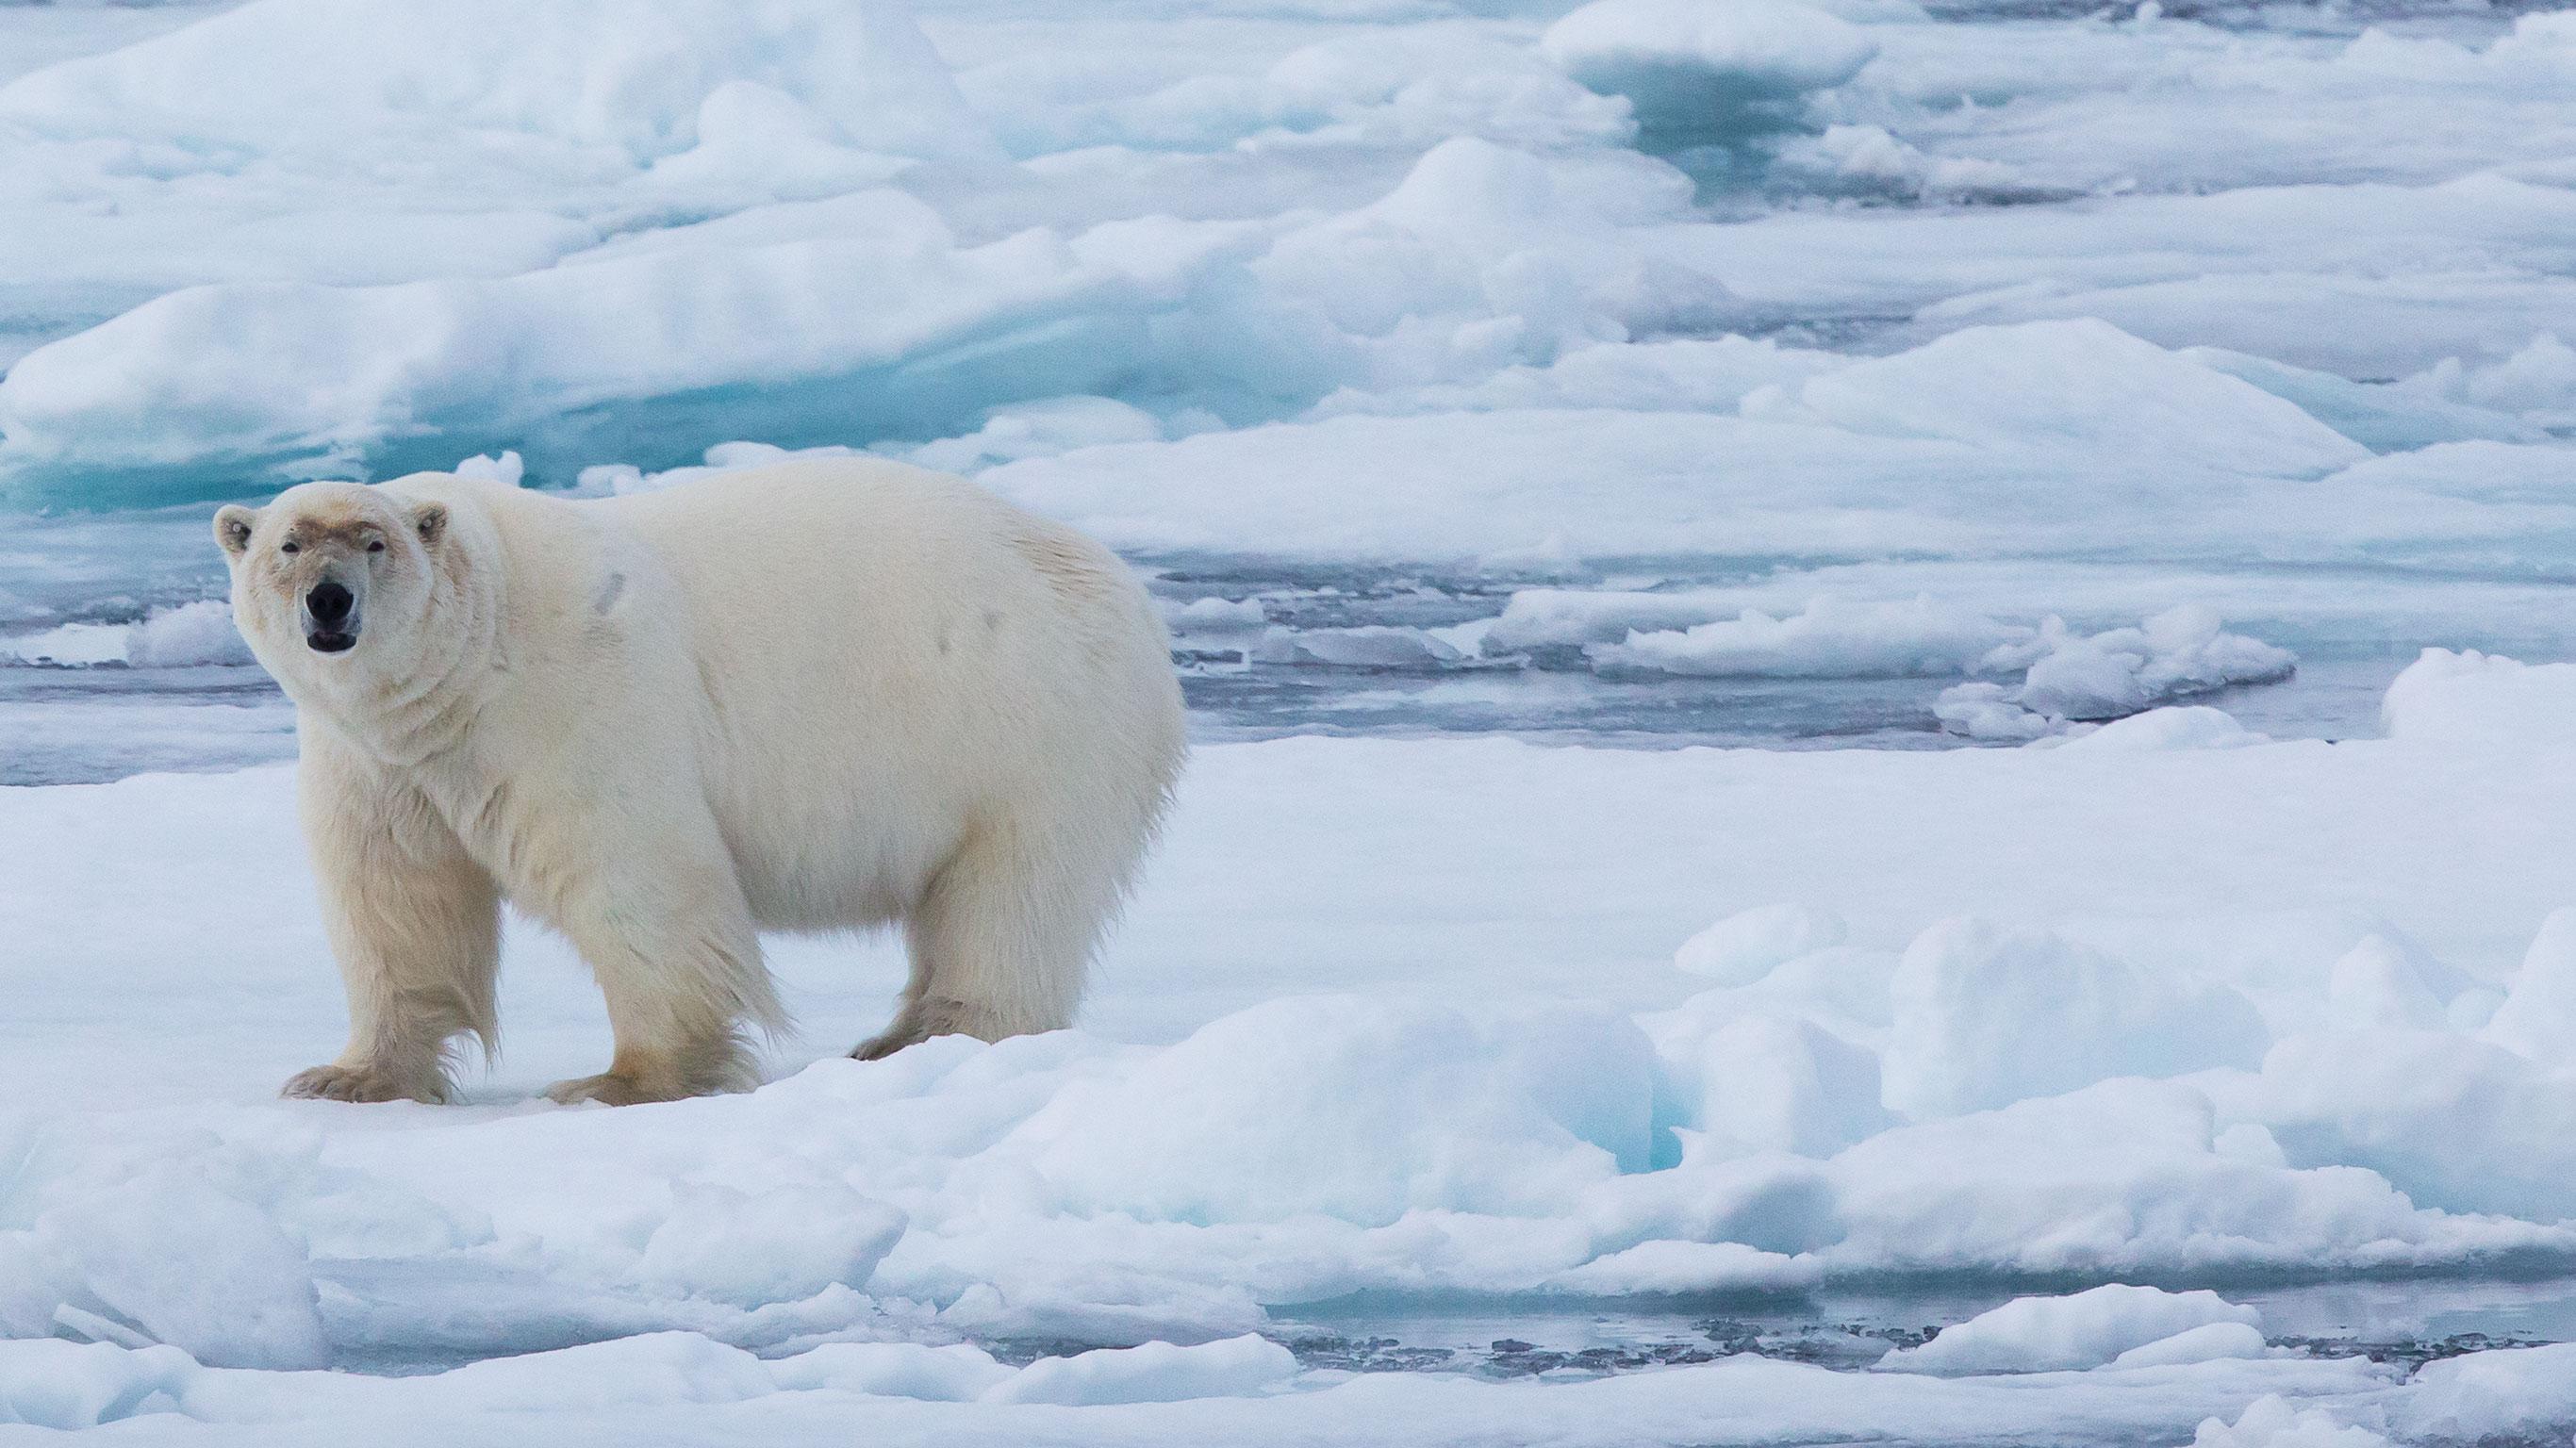 realm-of-the-polar-bear-in-depth